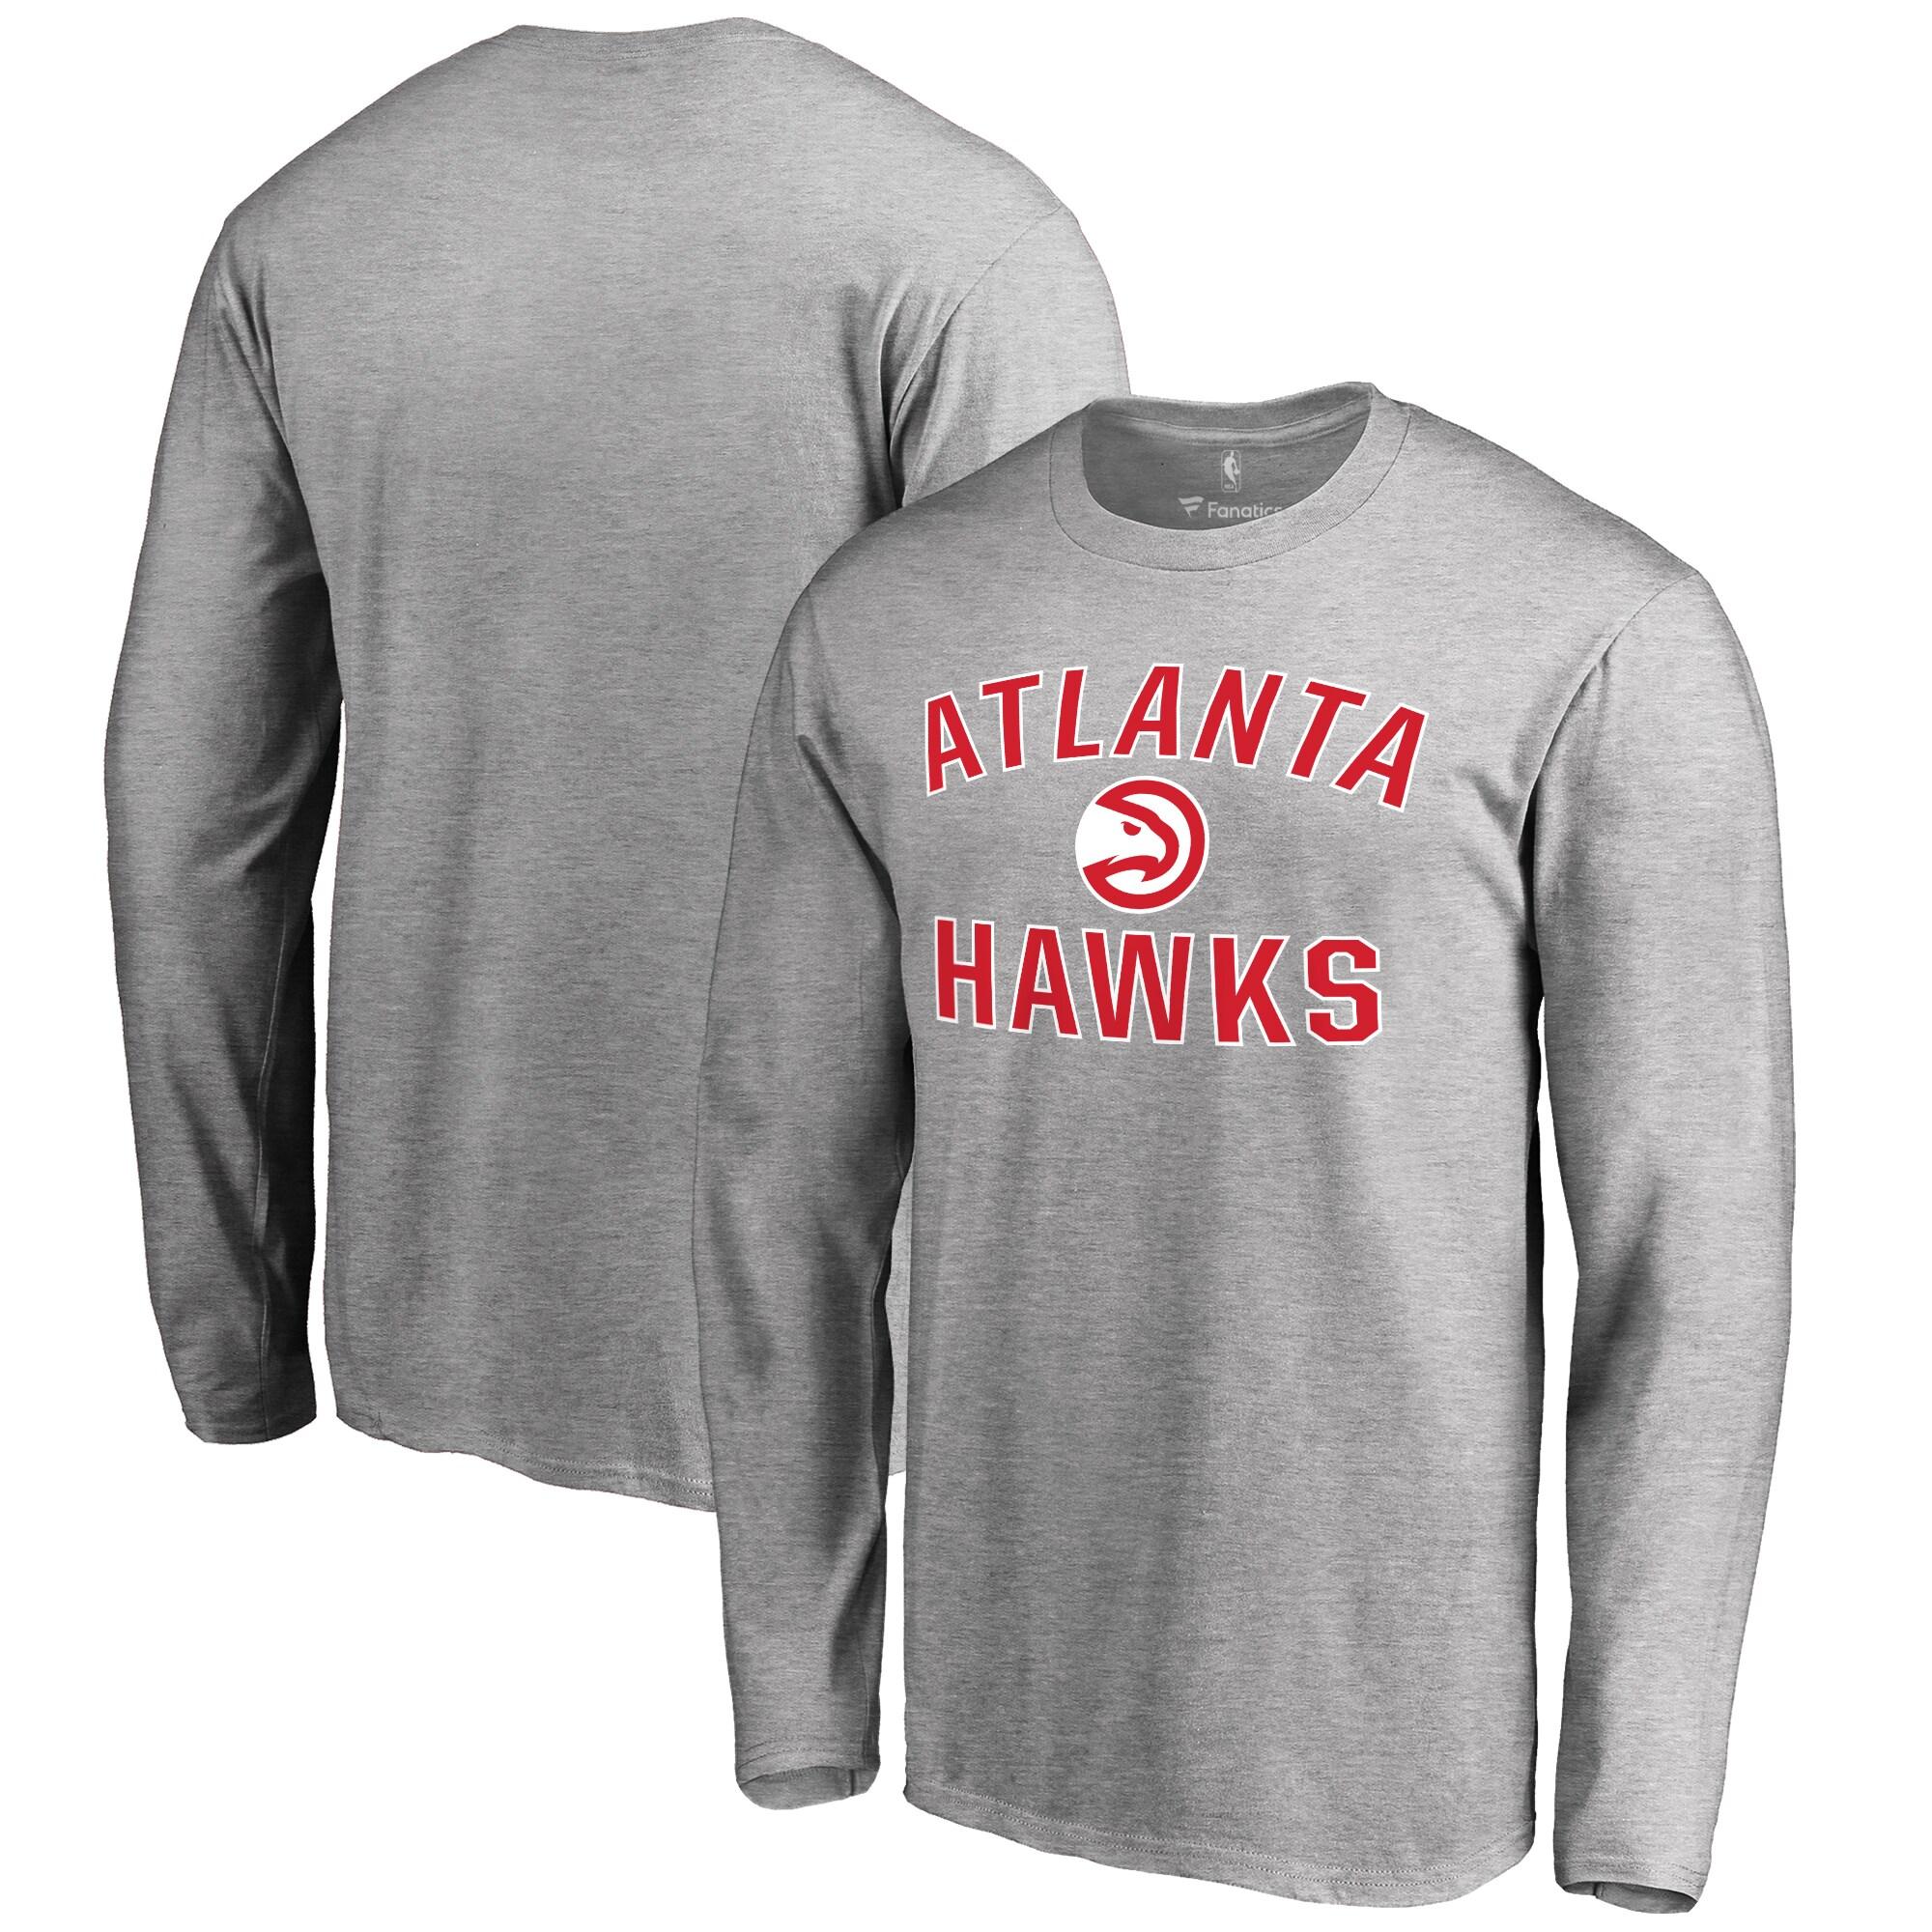 Atlanta Hawks Big & Tall Victory Arch Long Sleeve T-Shirt - Ash